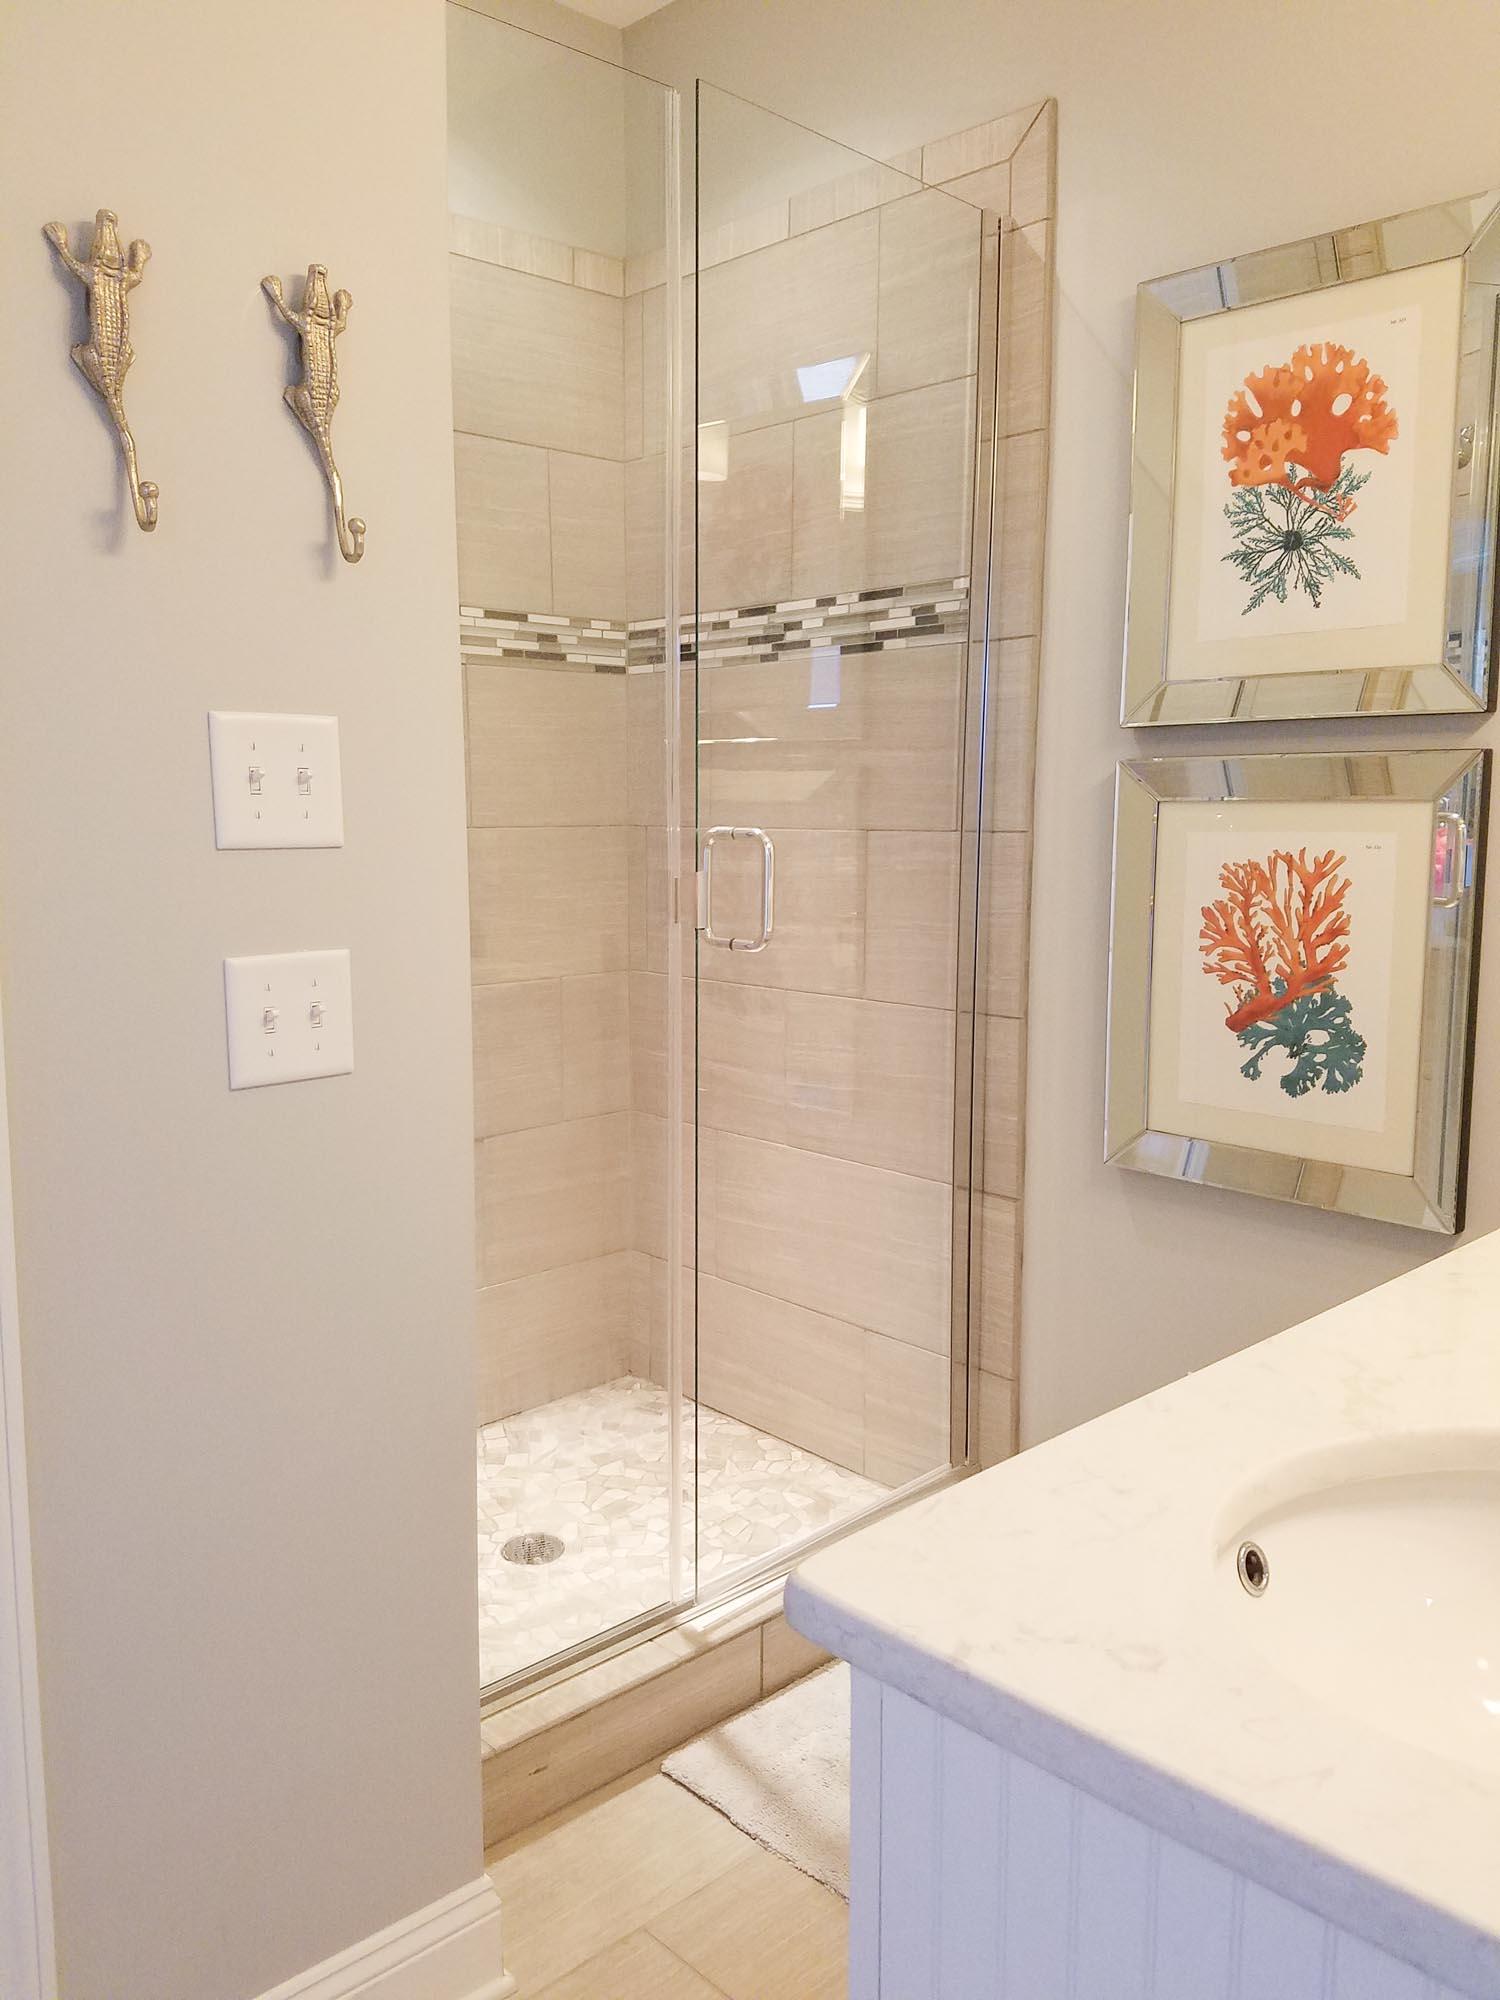 Grey tile shower with glass door gator themed towel hooks